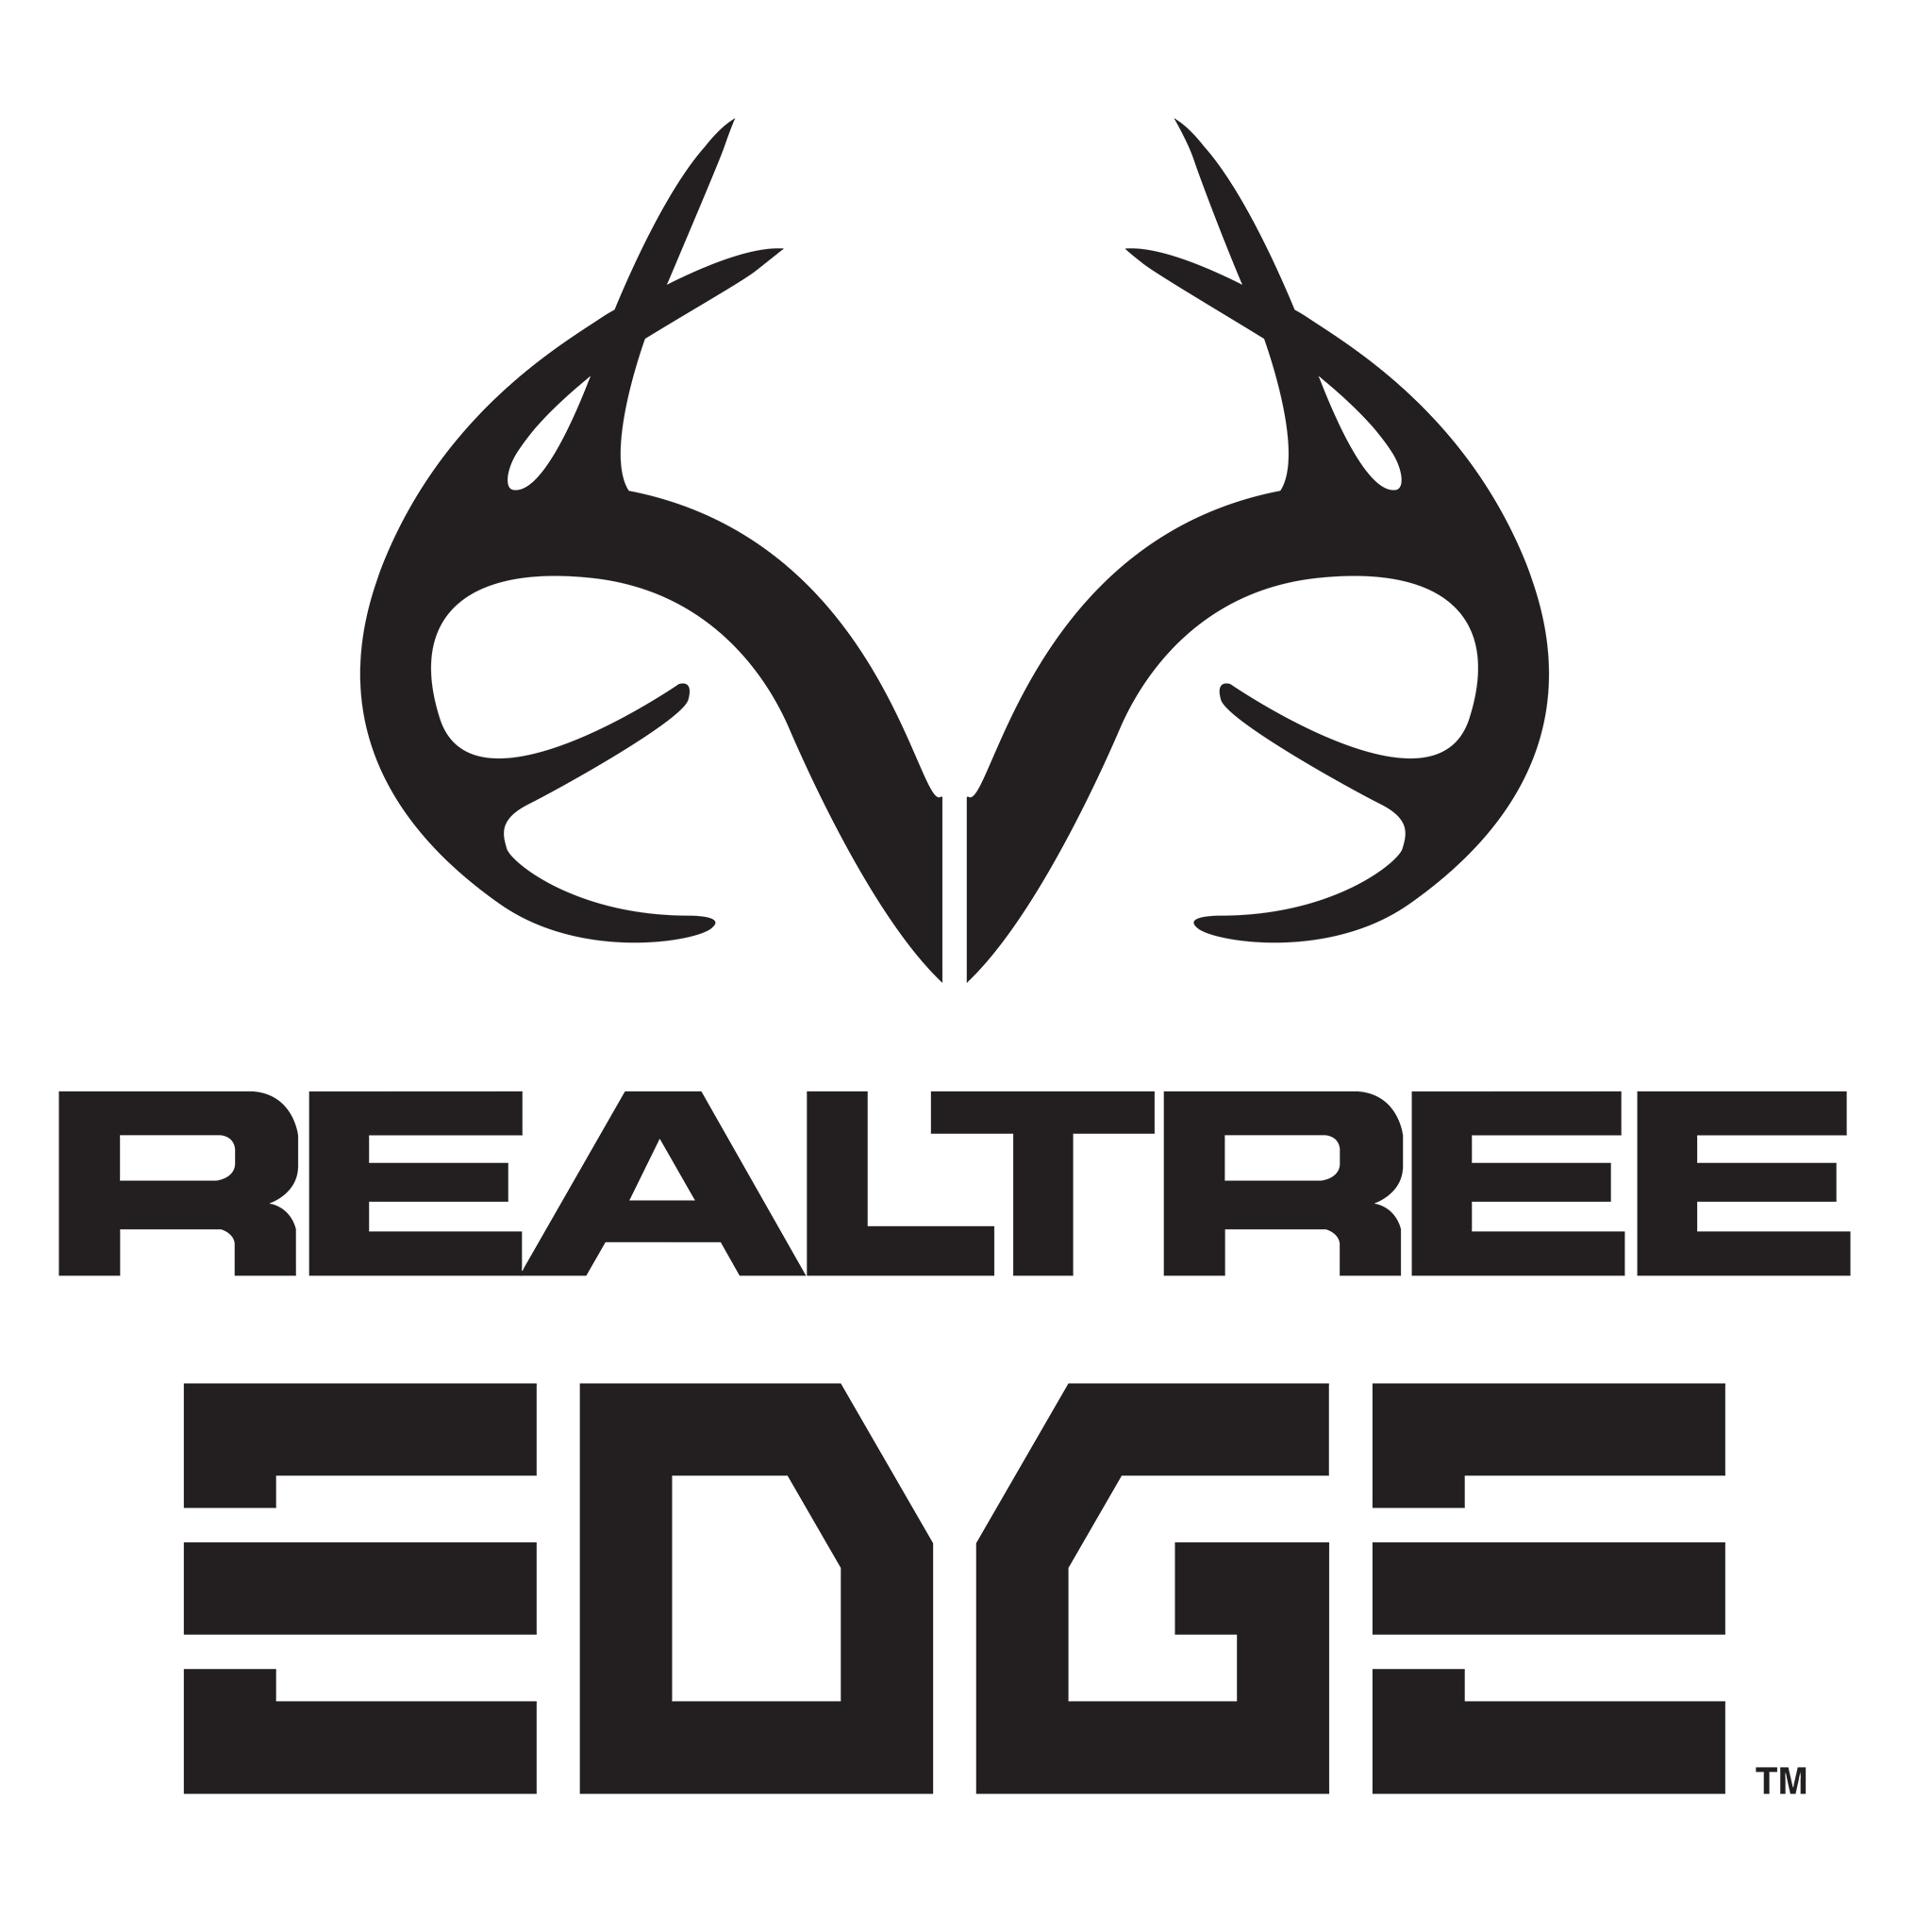 OLP_Realtree_Edge_black_vertical.jpeg